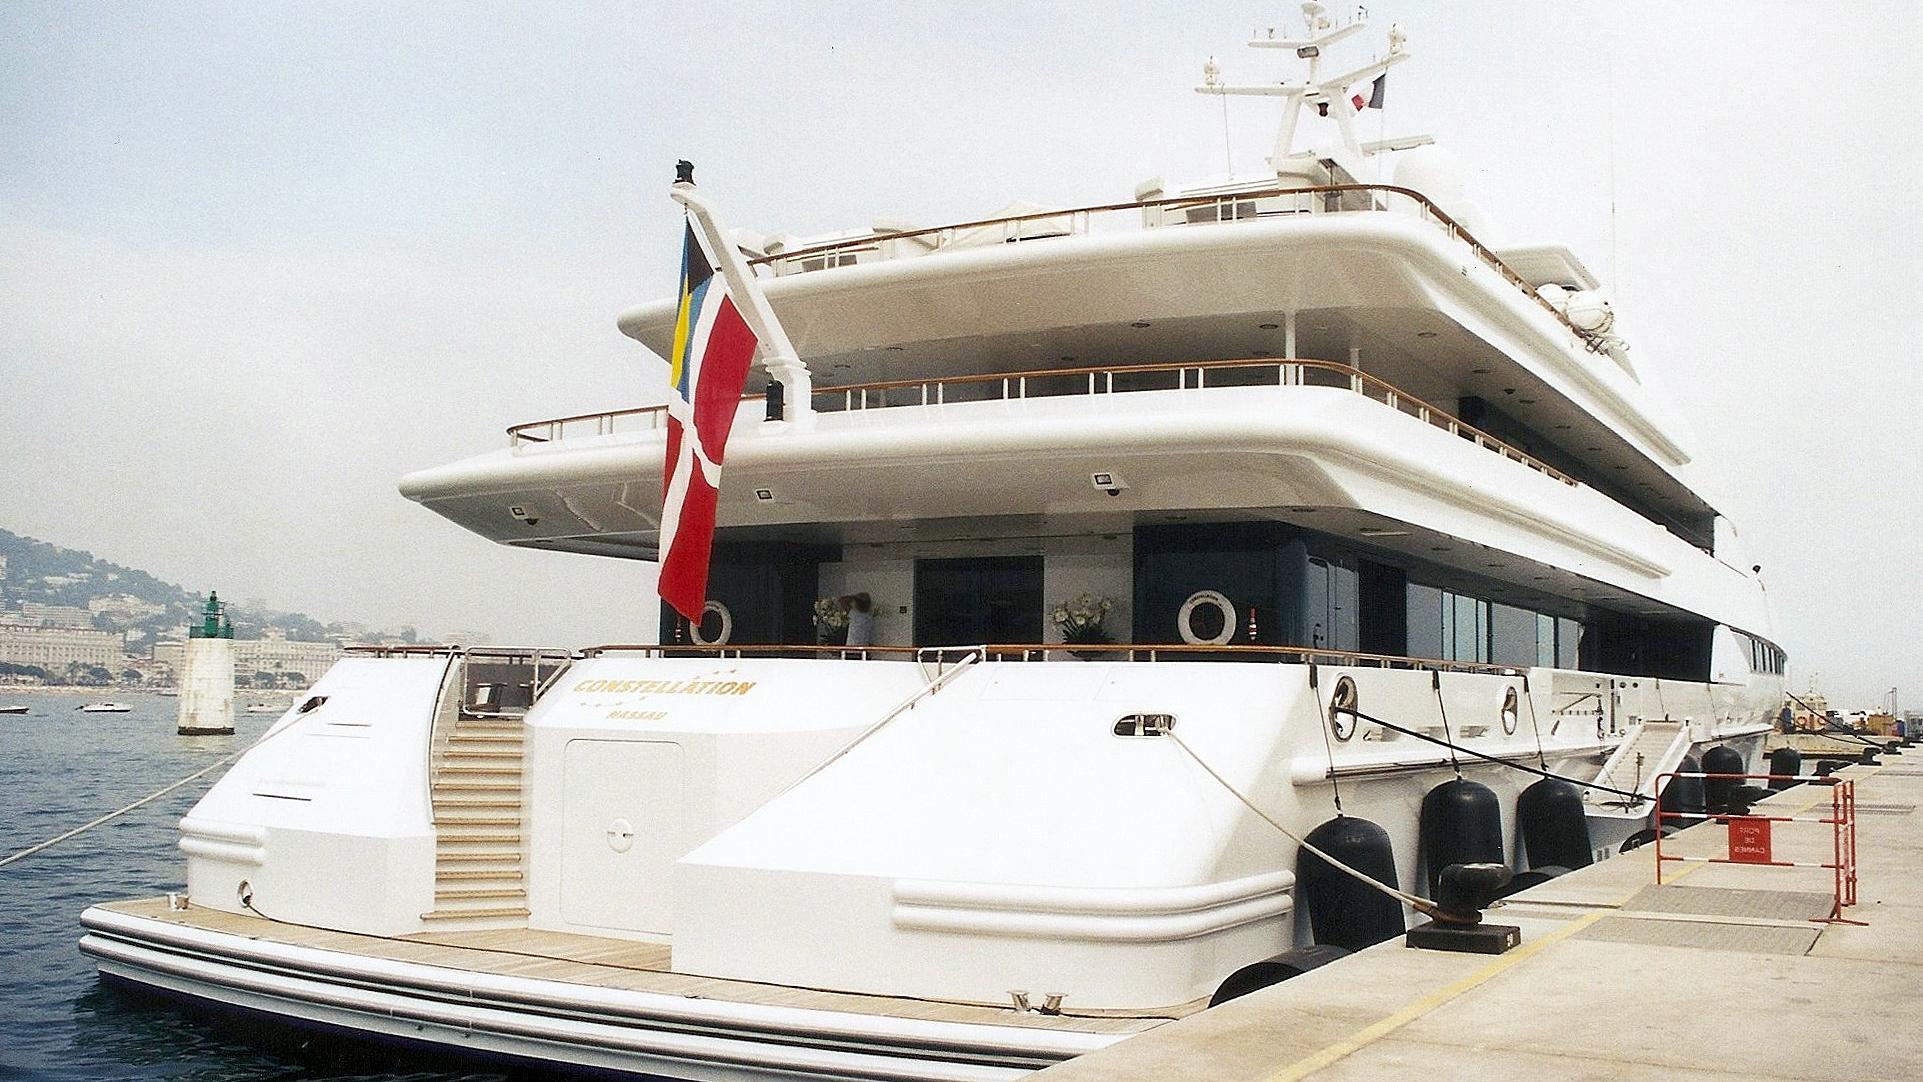 constellation-motor-yacht-oceanco-1999-80m-stern